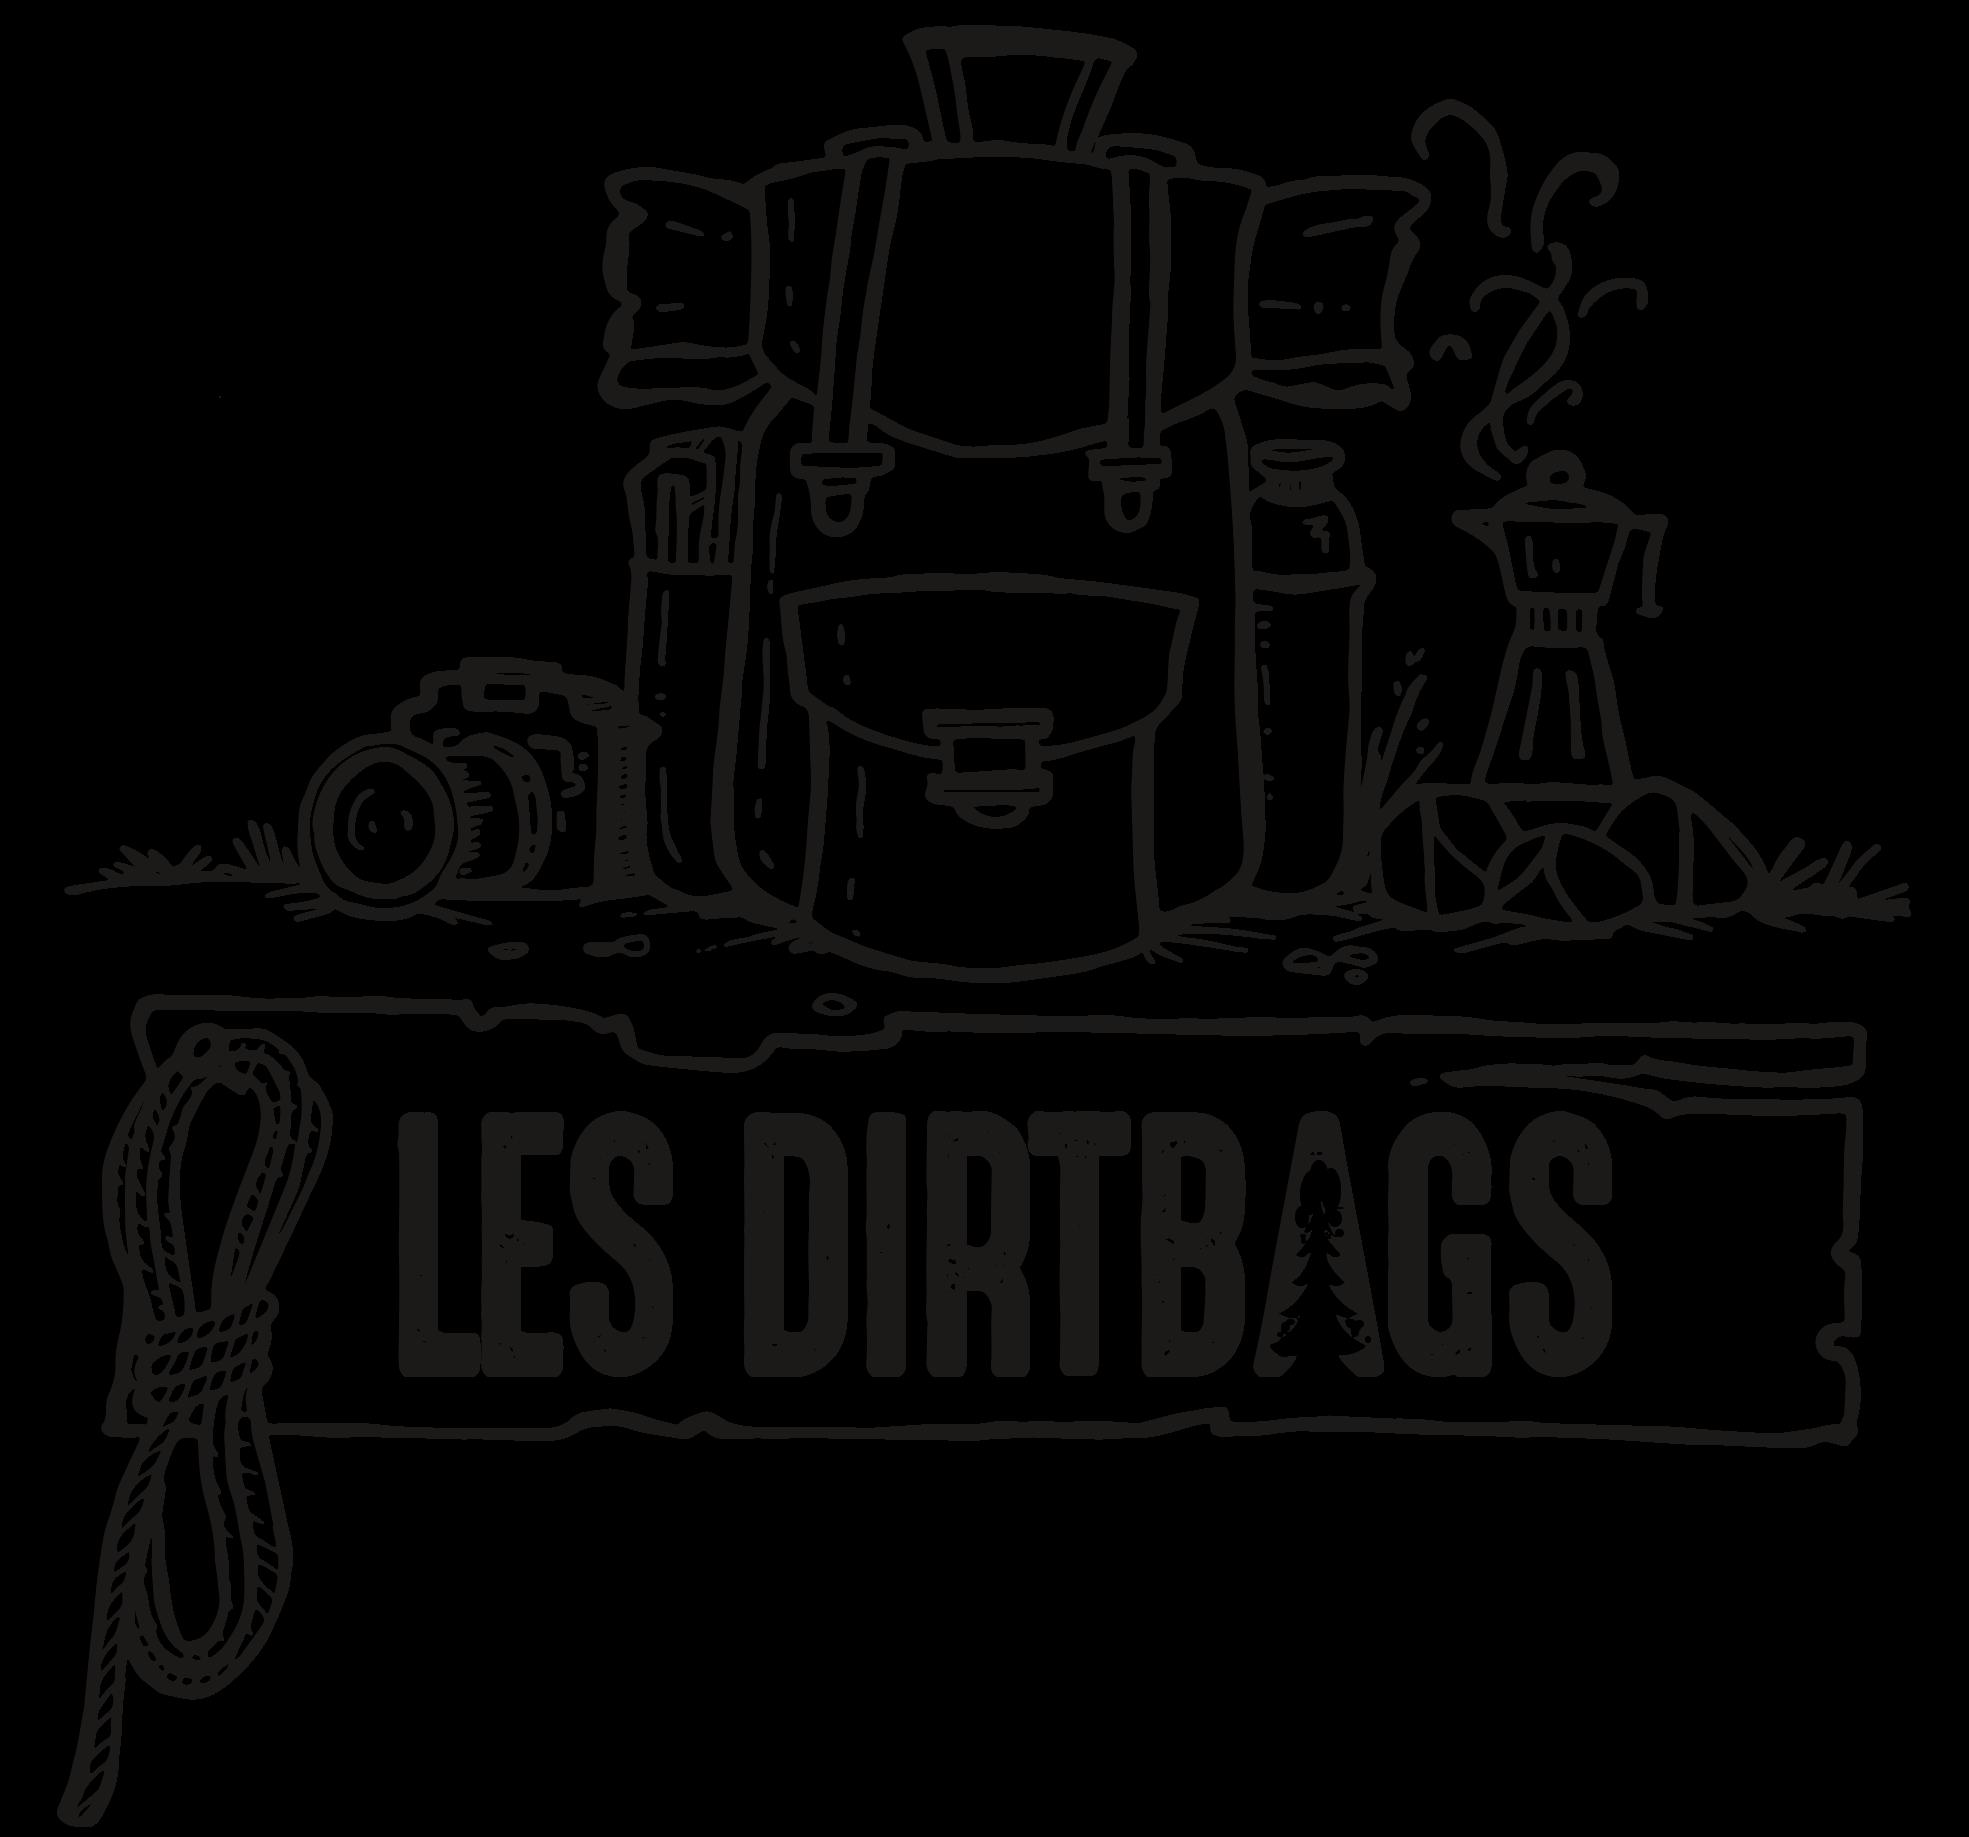 Les Dirtbags